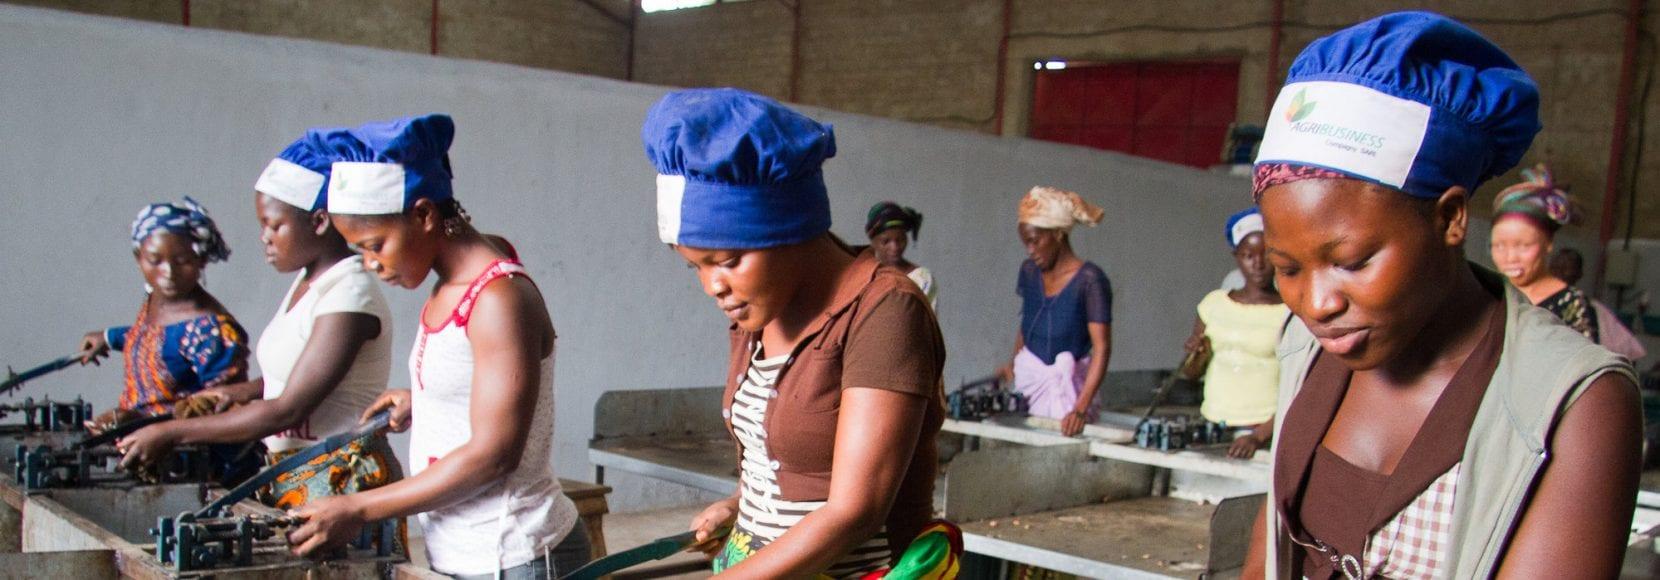 Women deshelling cashews, Agri-Business Company cashew factory, Touba, C™te d'Ivoire. Photo © Nile Sprague Women deshelling cashews, Agri-Business Company cashew factory, Touba, Côte d'Ivoire. Photo © Nile Sprague